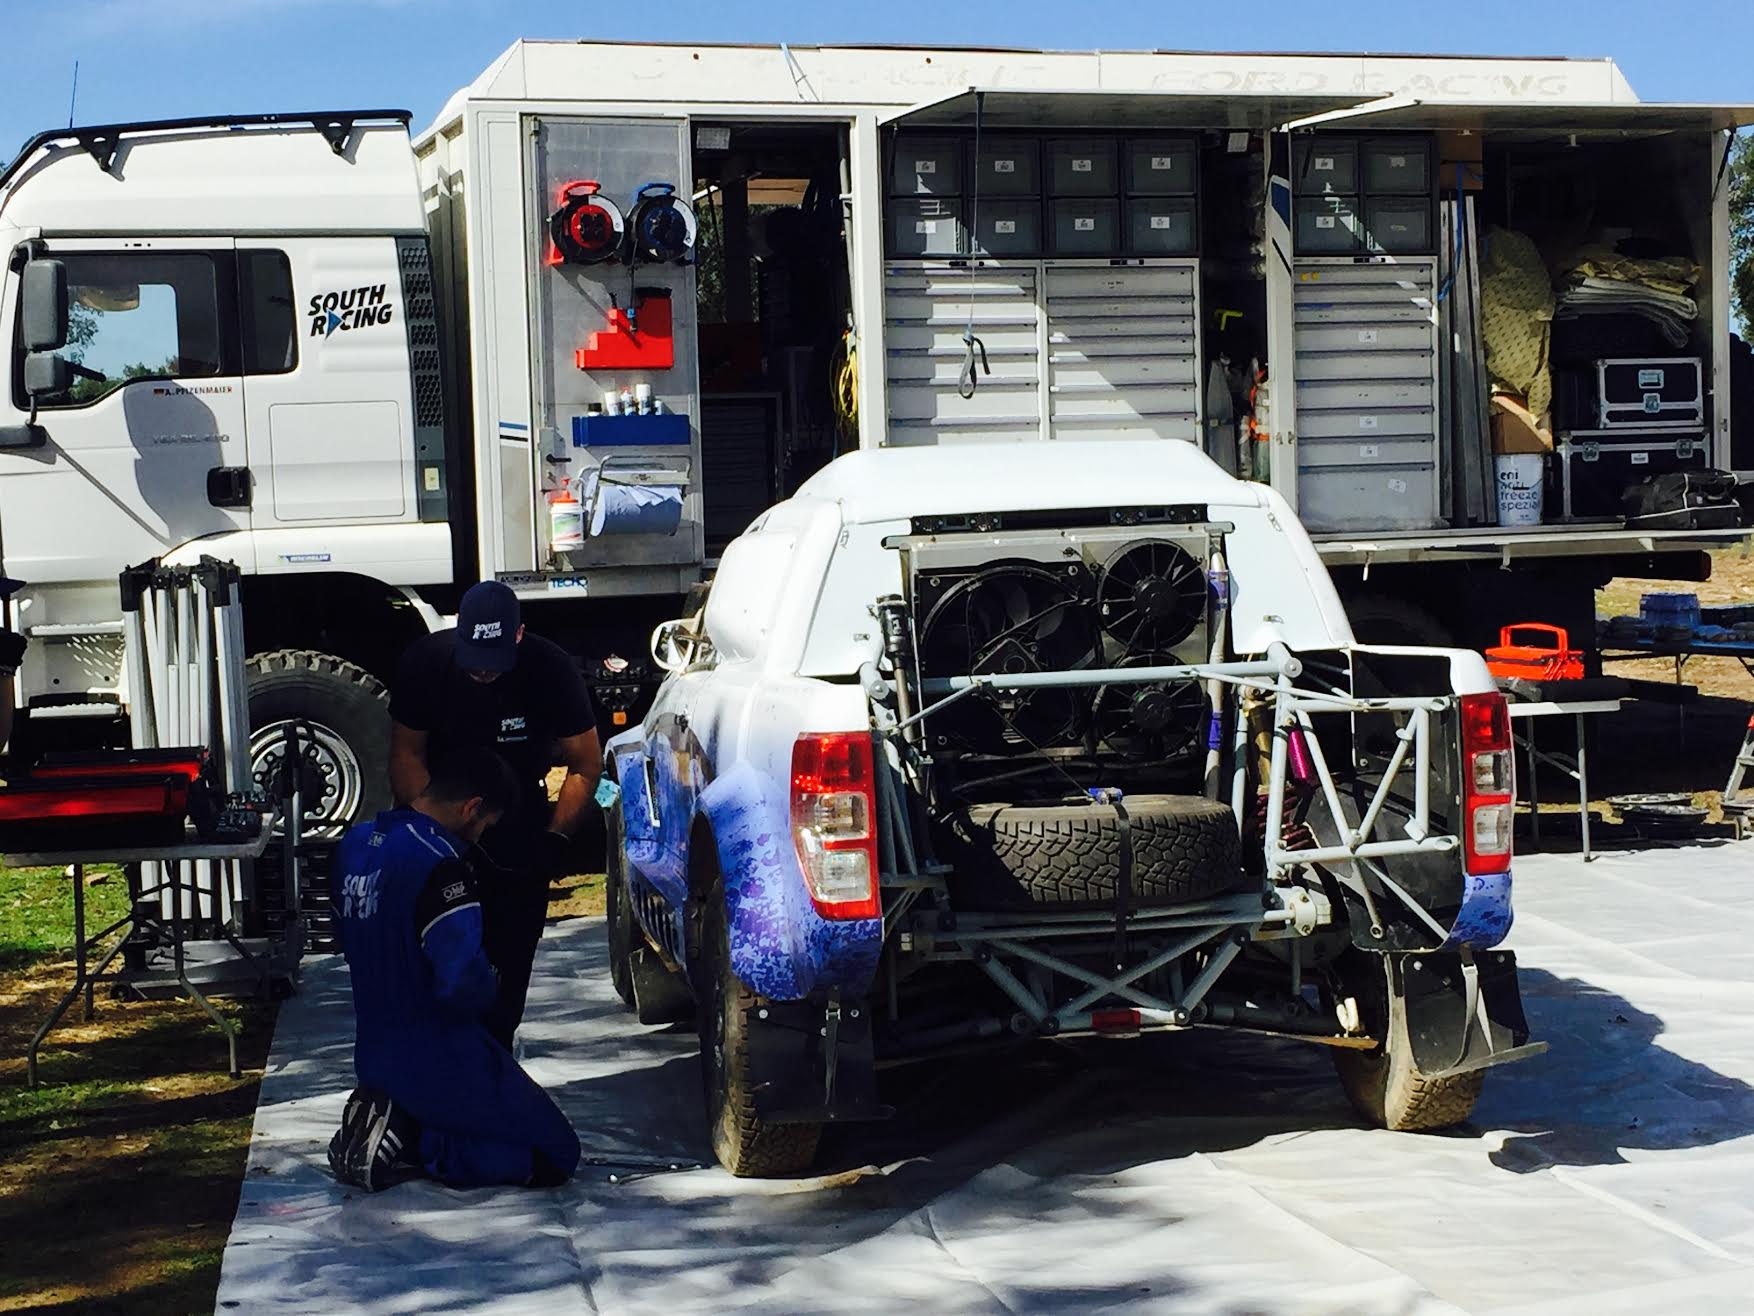 2016 Rallye Raid Dakar Argentina - Bolivia [3-16 Enero] - Página 2 CTDTtwOWoAAHPFX